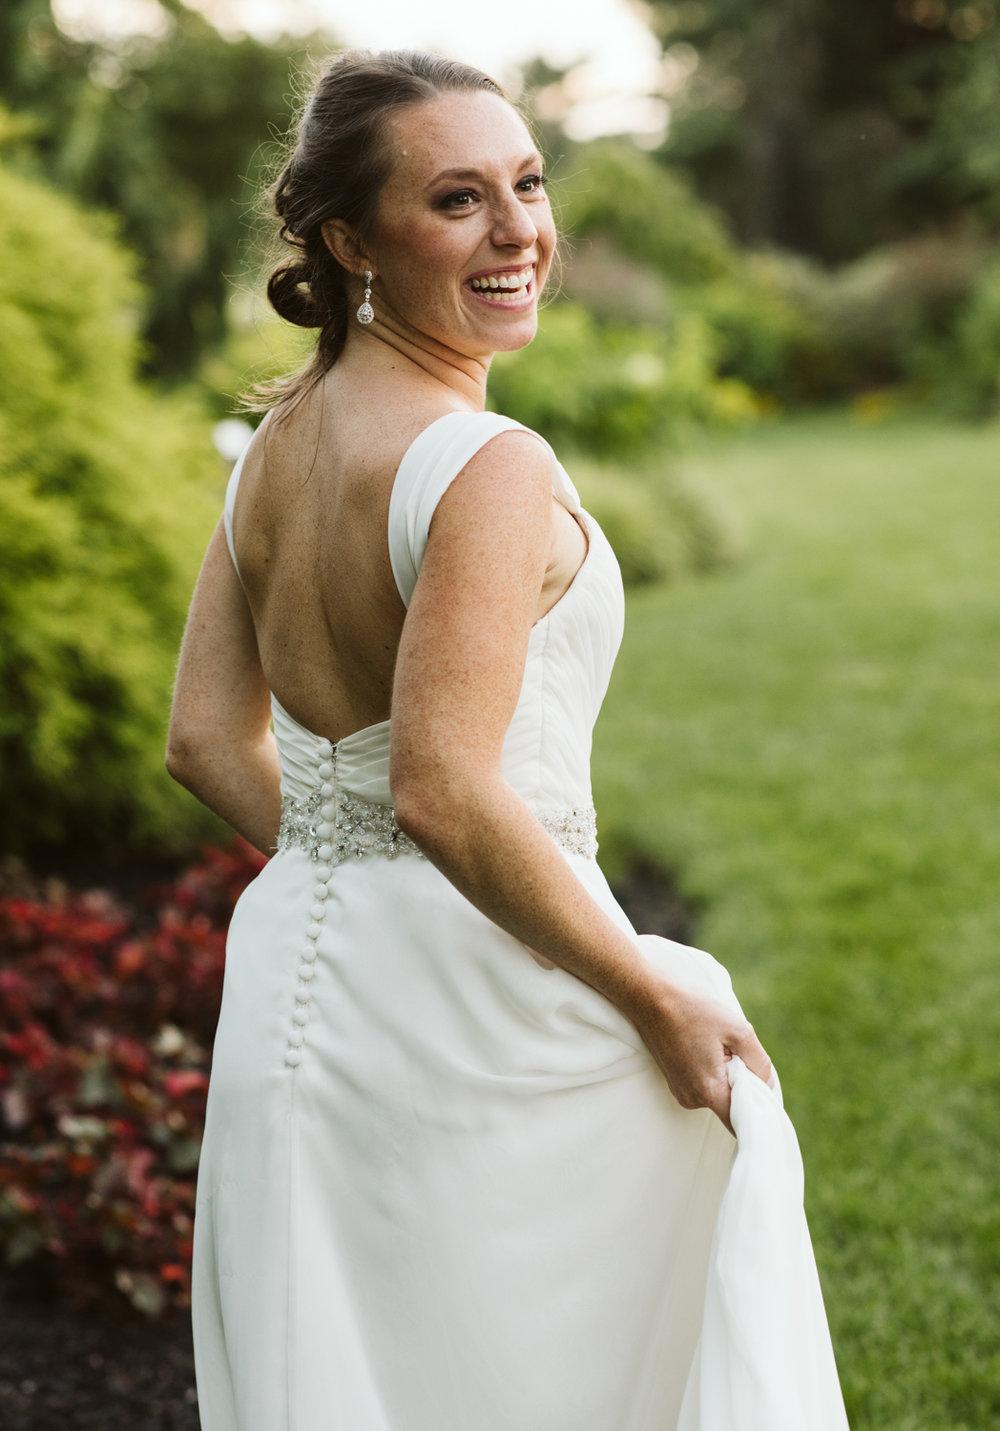 emily_alex_elm_bank_wedding_wellesley_DSC_8291.jpg